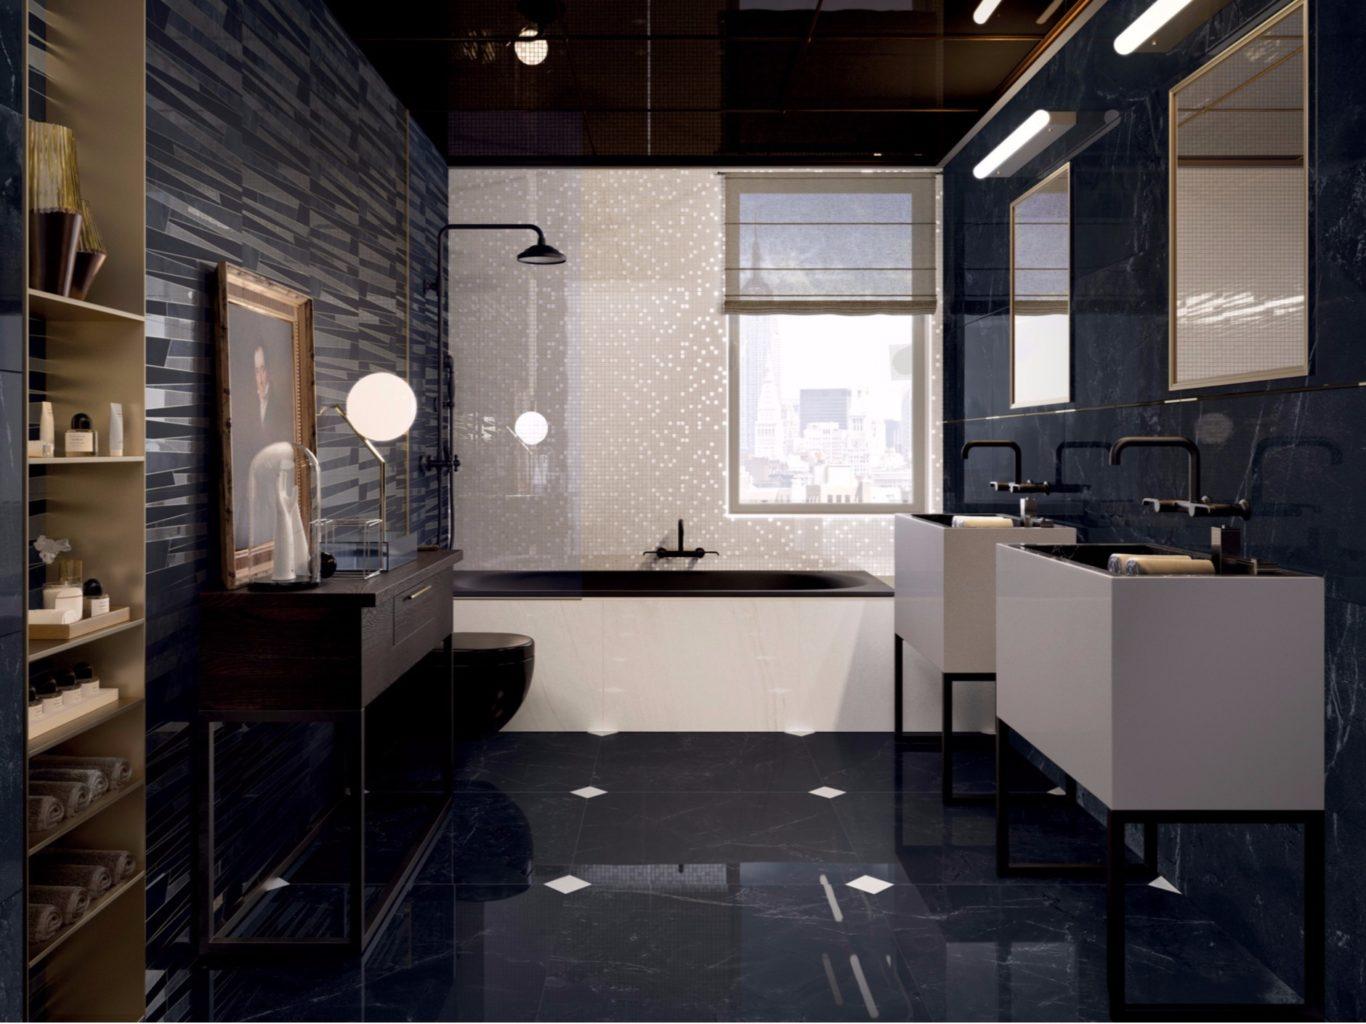 baltex home timeless values. Black Bedroom Furniture Sets. Home Design Ideas